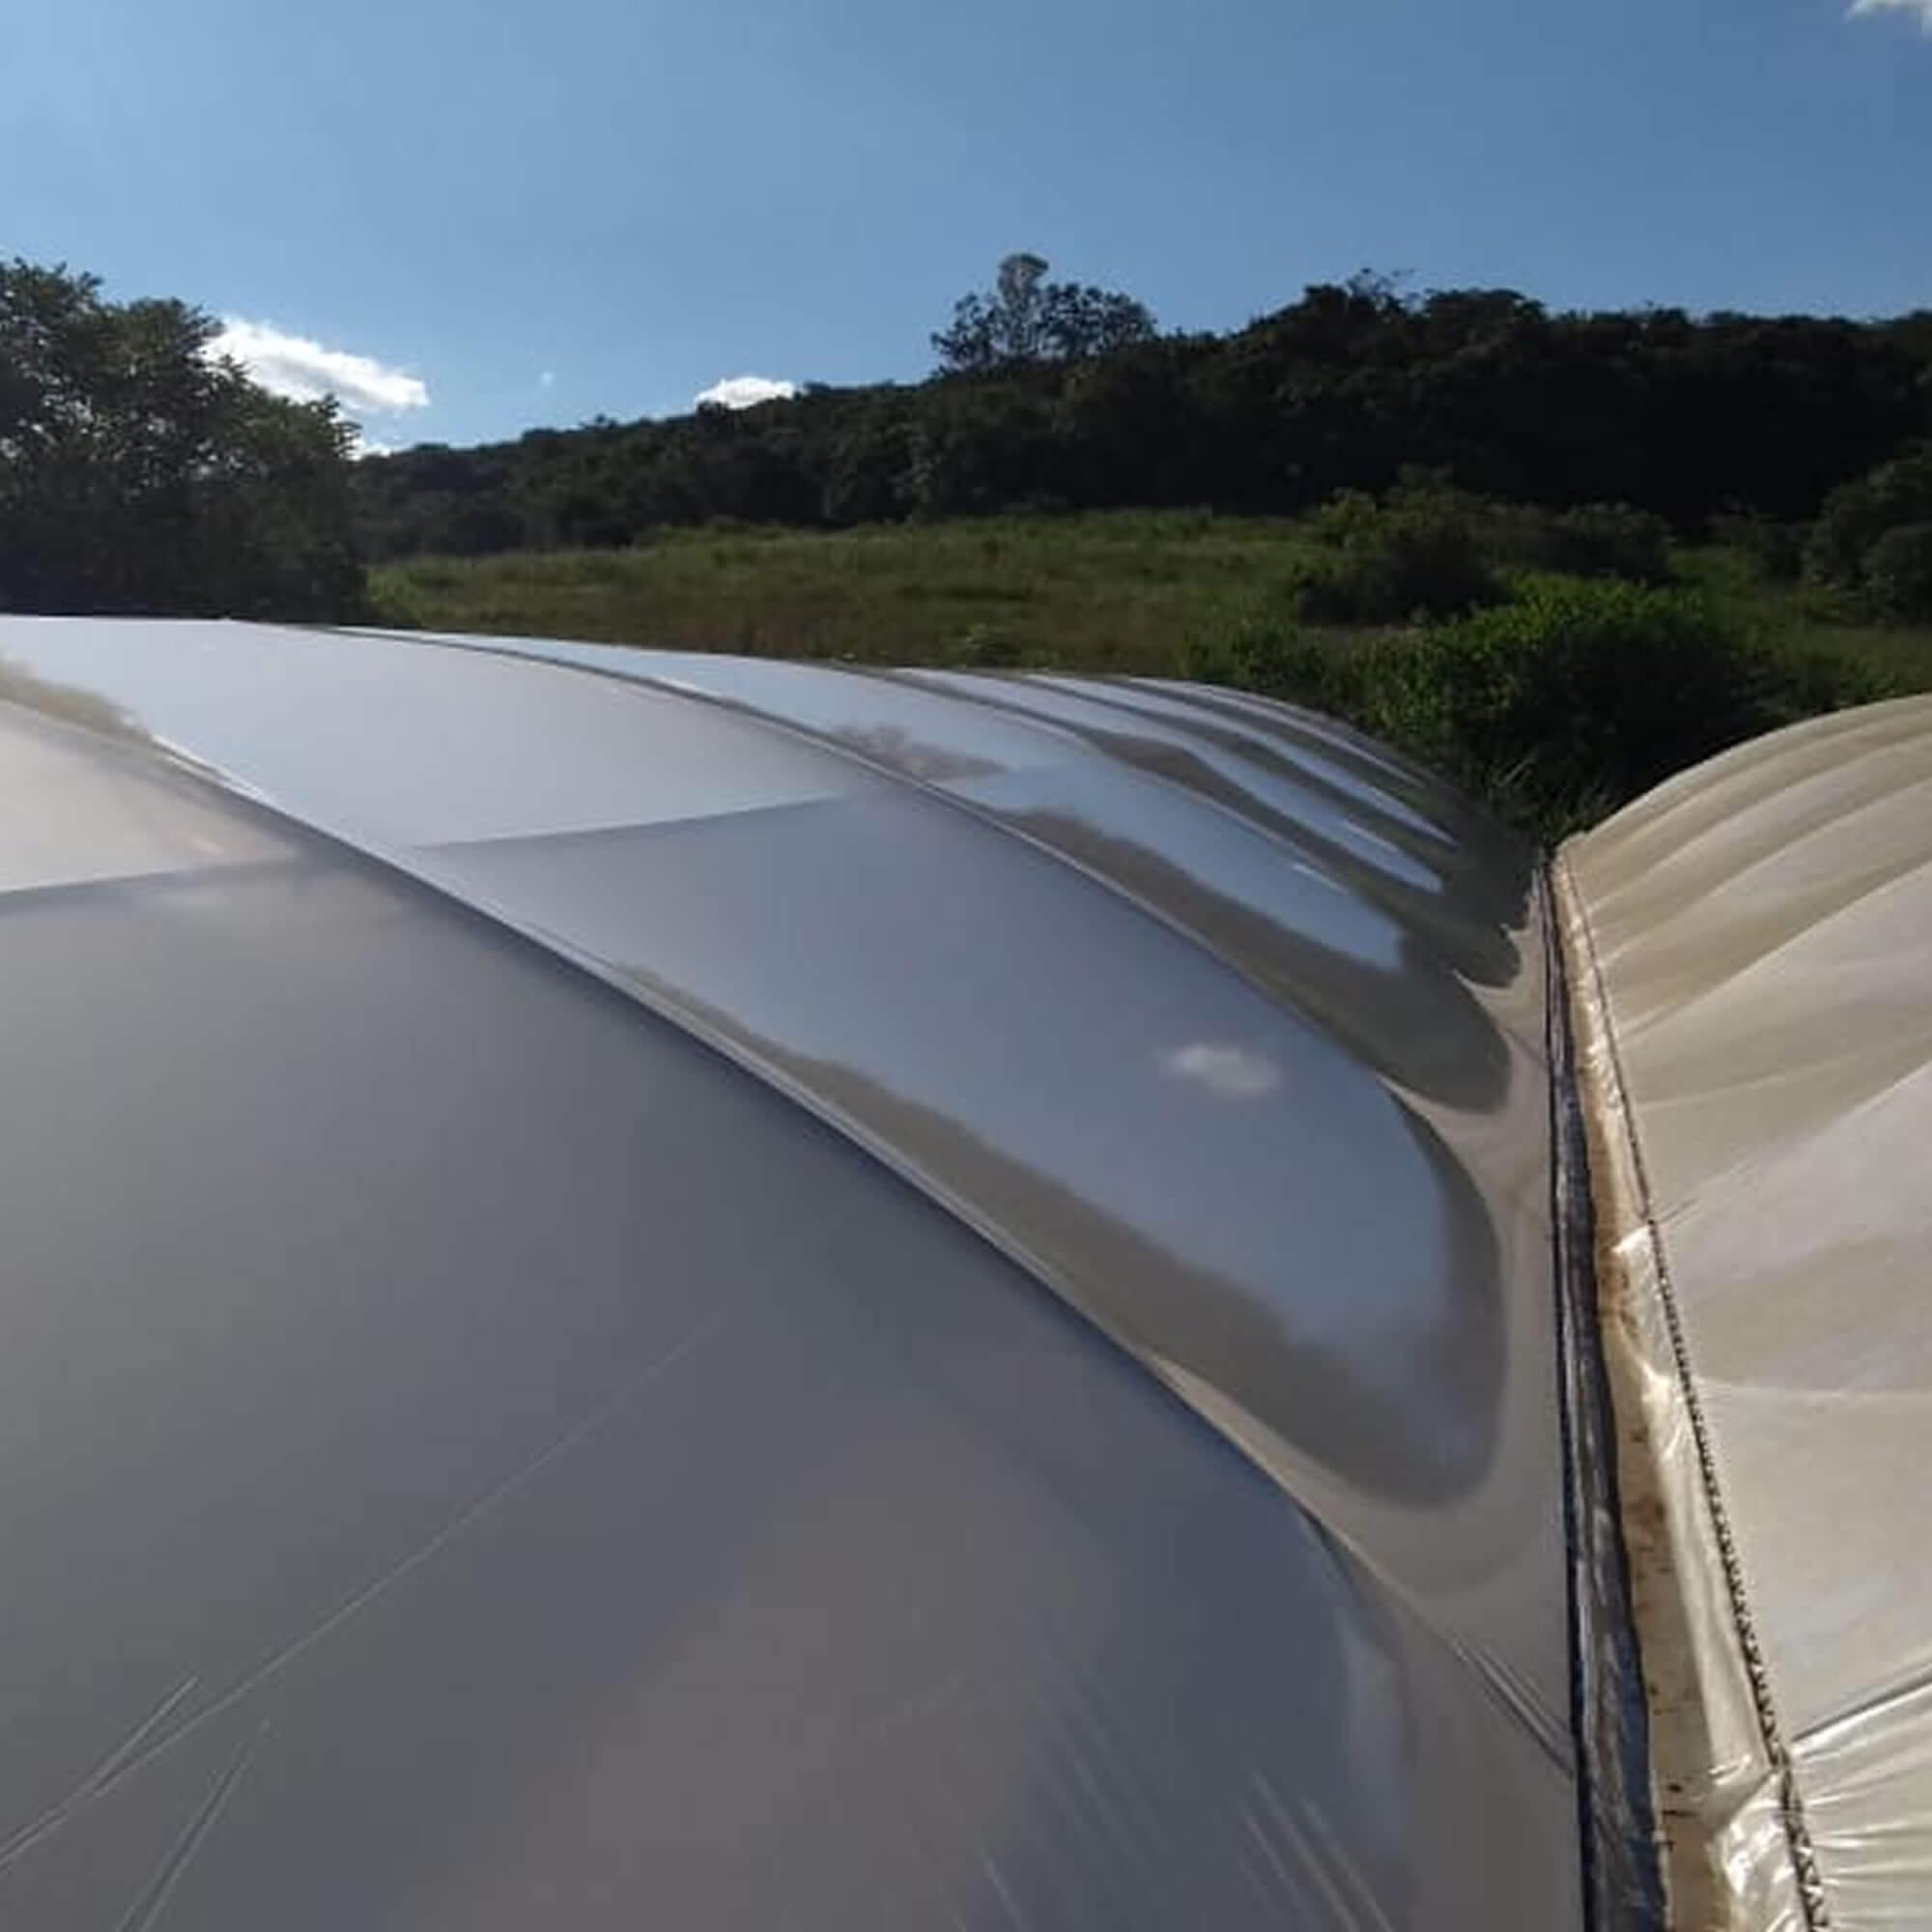 Filme Plástico Difusor para Estufa - 8x55 metros - 100 micras - Politiv